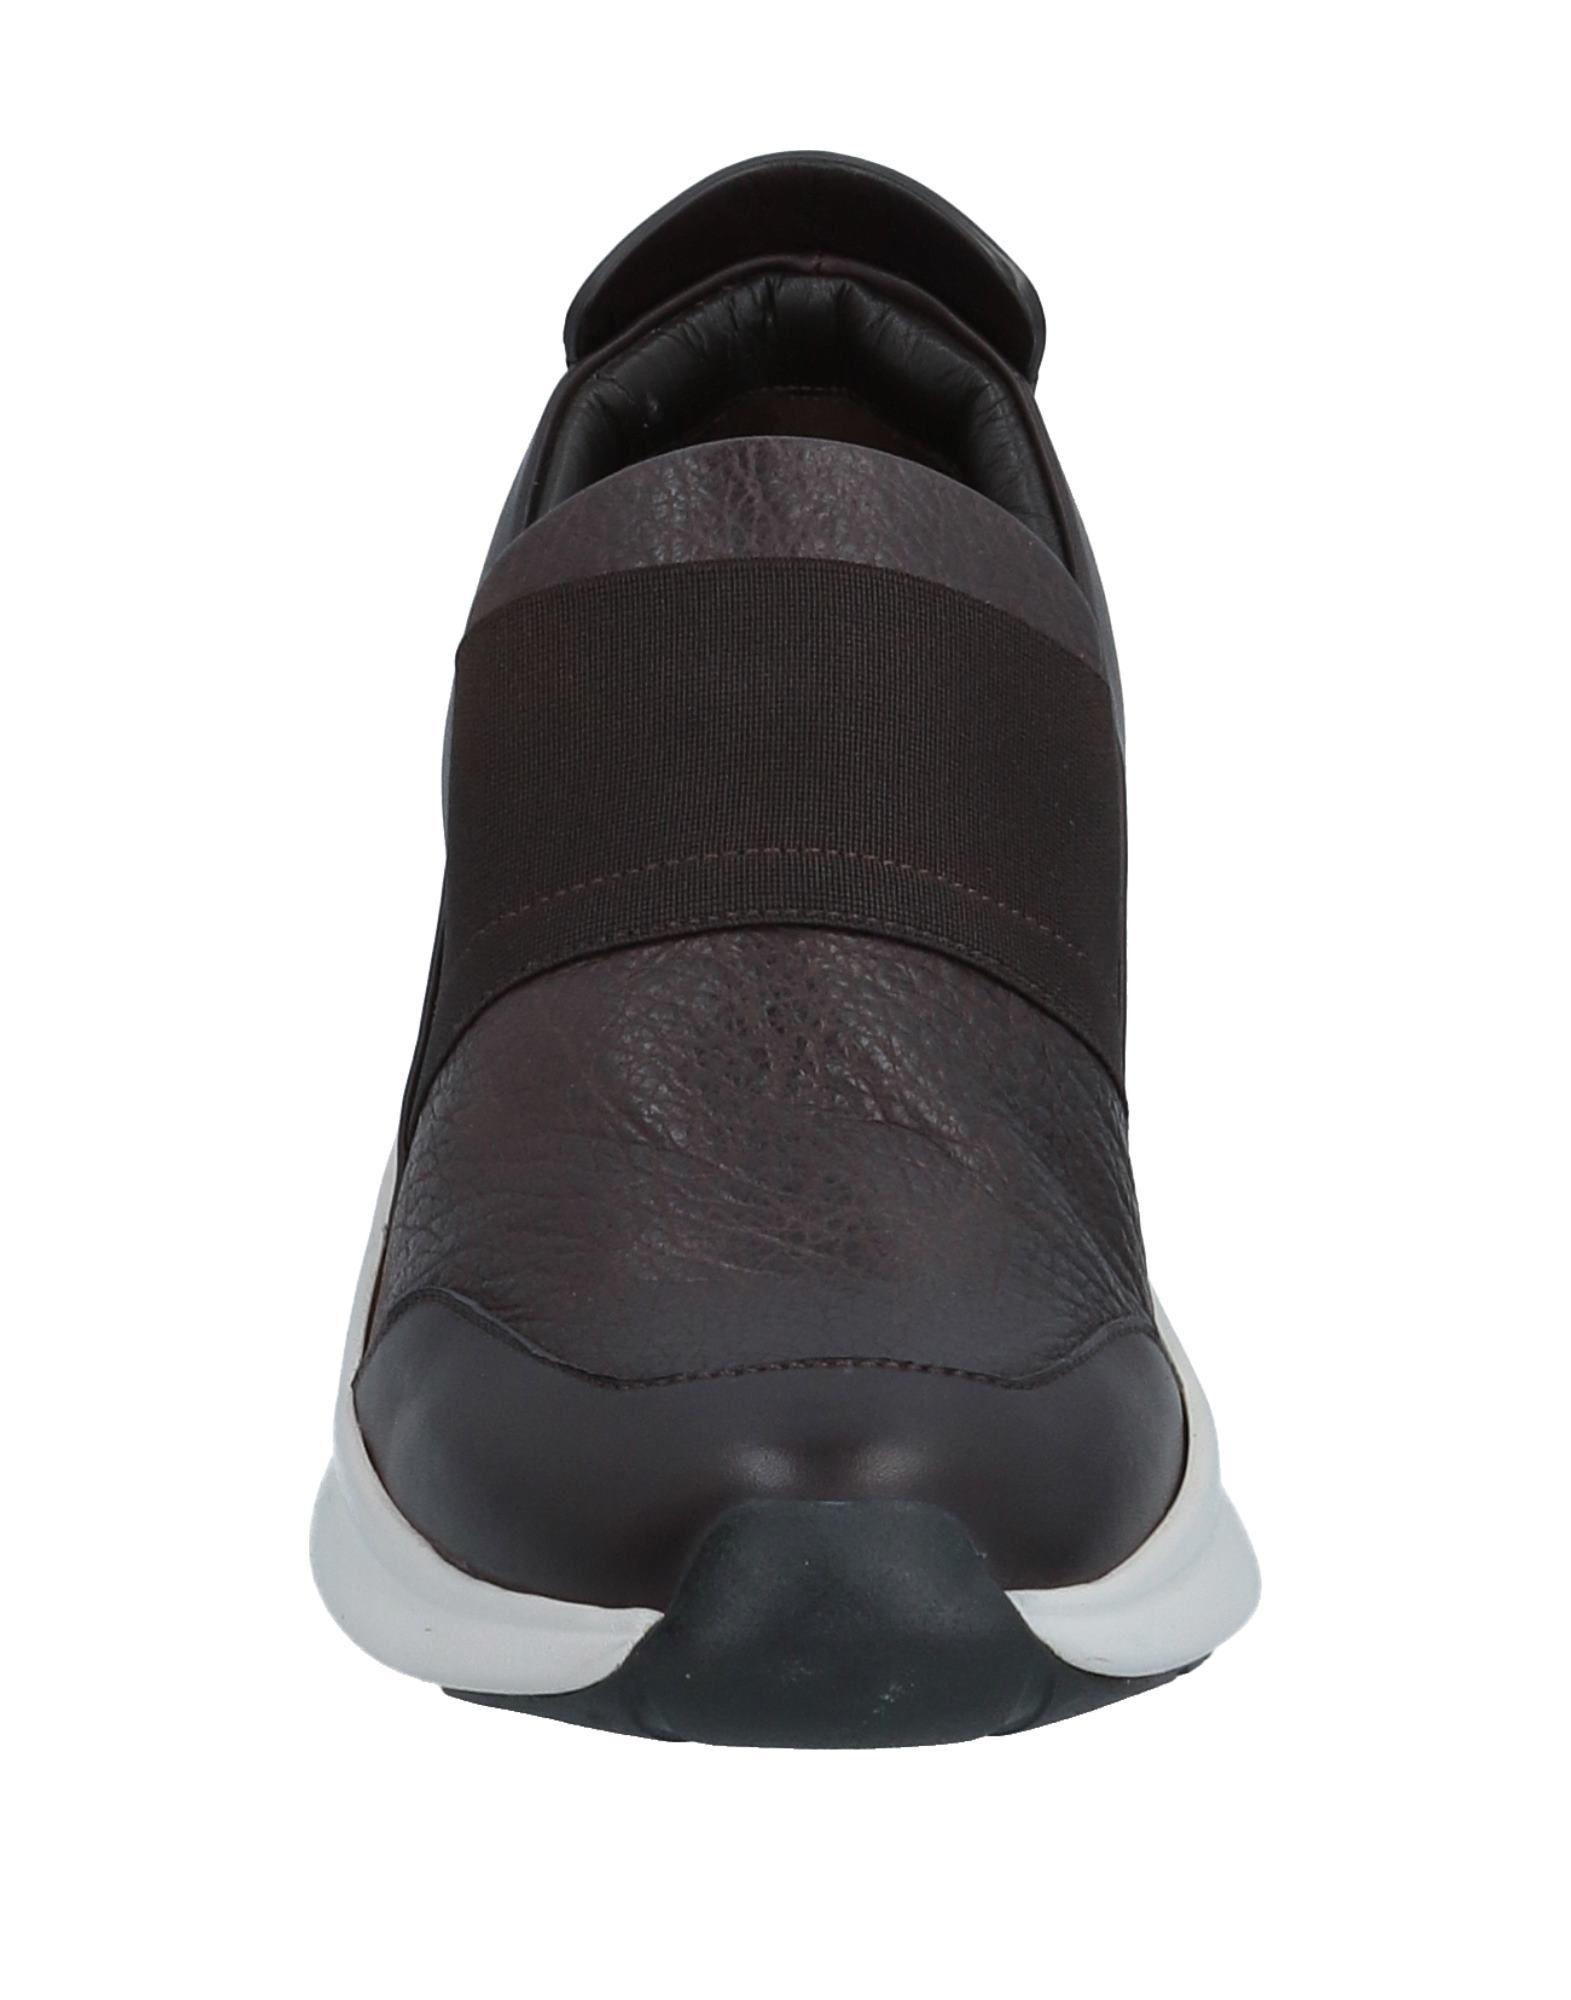 Gentryportofino Sneakers Schuhe Damen  11515801TV Heiße Schuhe Sneakers f0a0d6